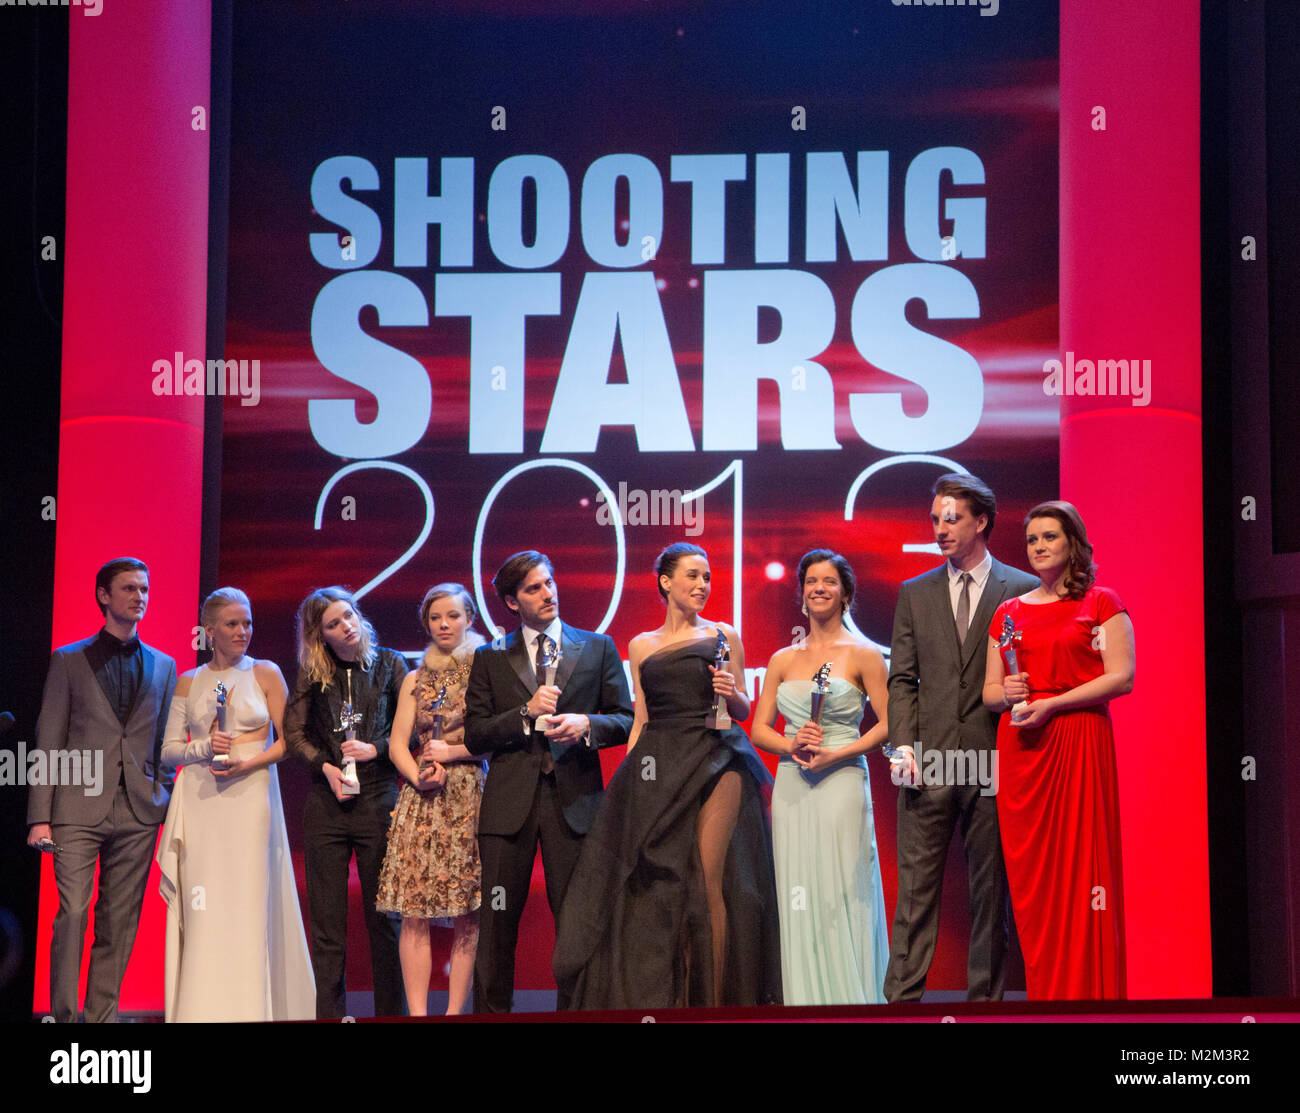 63. Internationale Filmfestspiele Berlin, Berlinale 2013, am 11.02.2013: Verleihung der Shooting Stars Awards 2013 - Stock Image